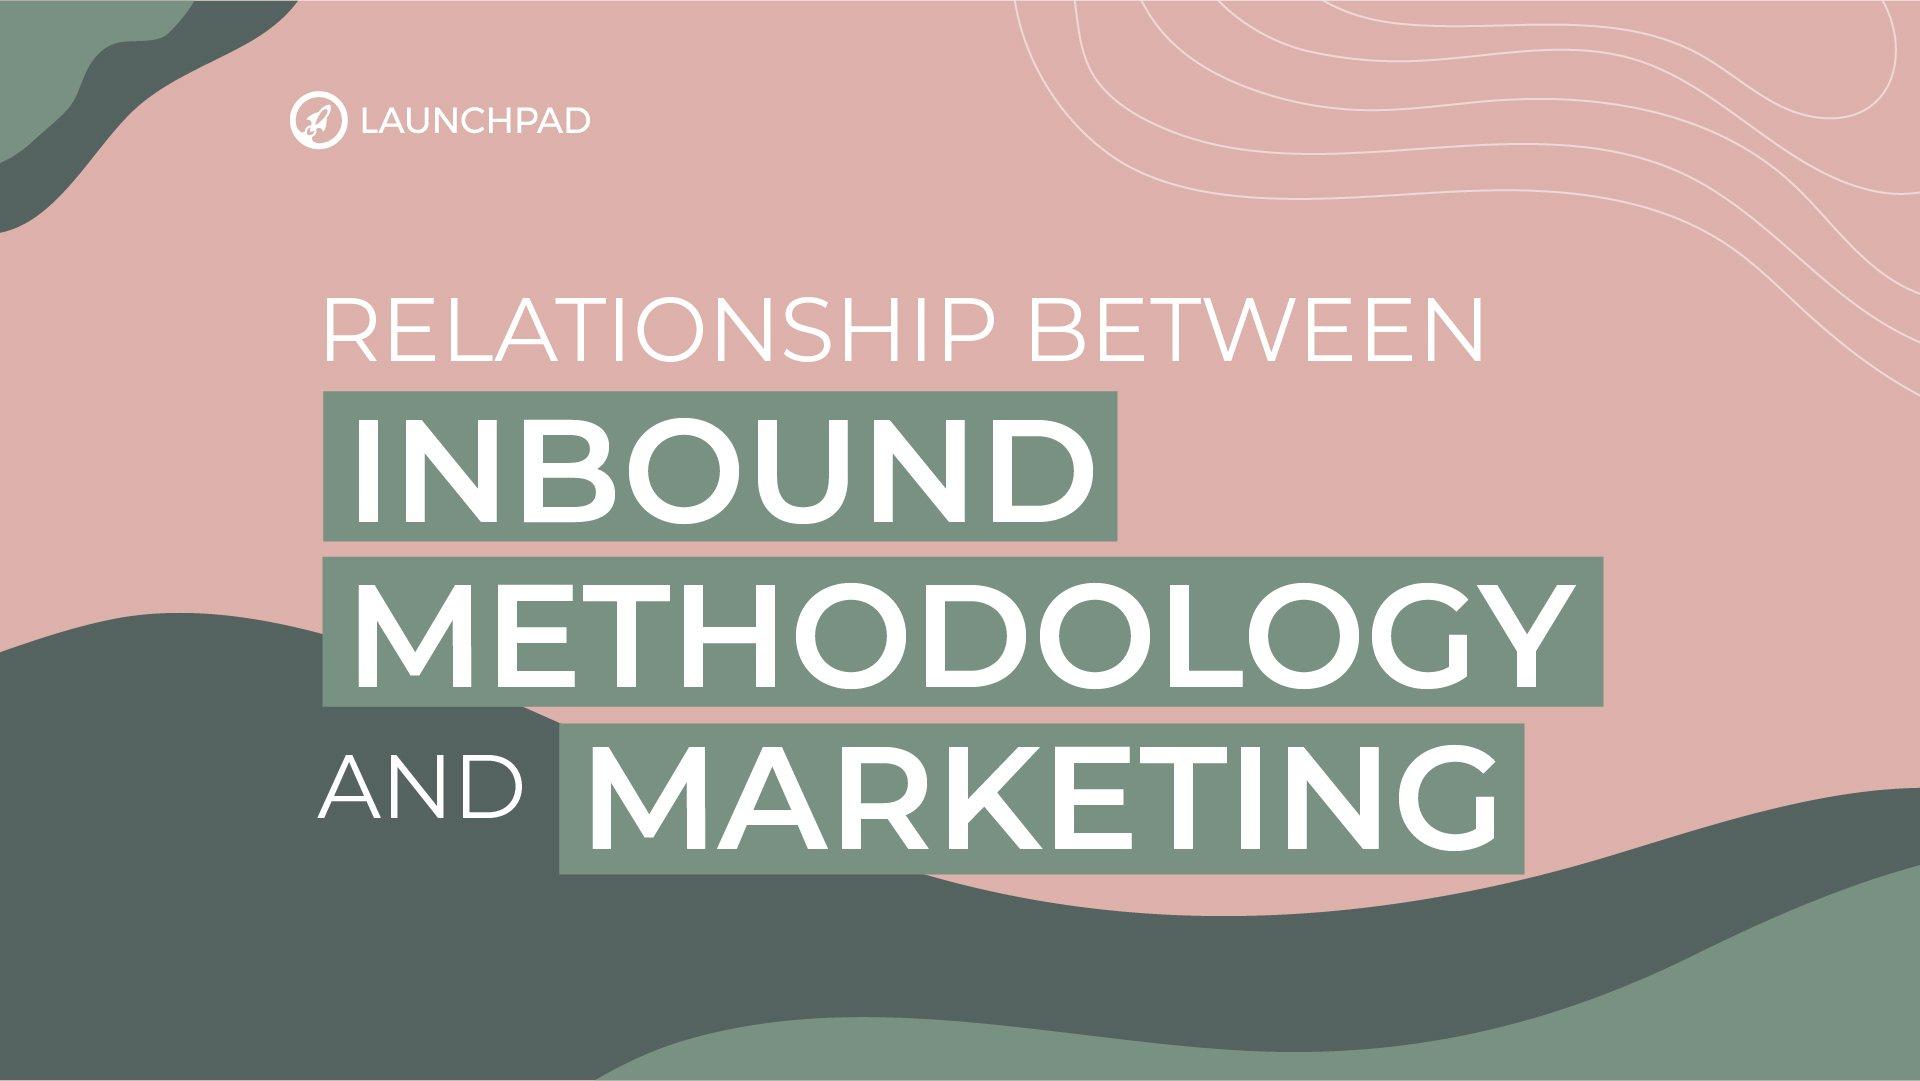 Relationship between Inbound Methodology and Marketing